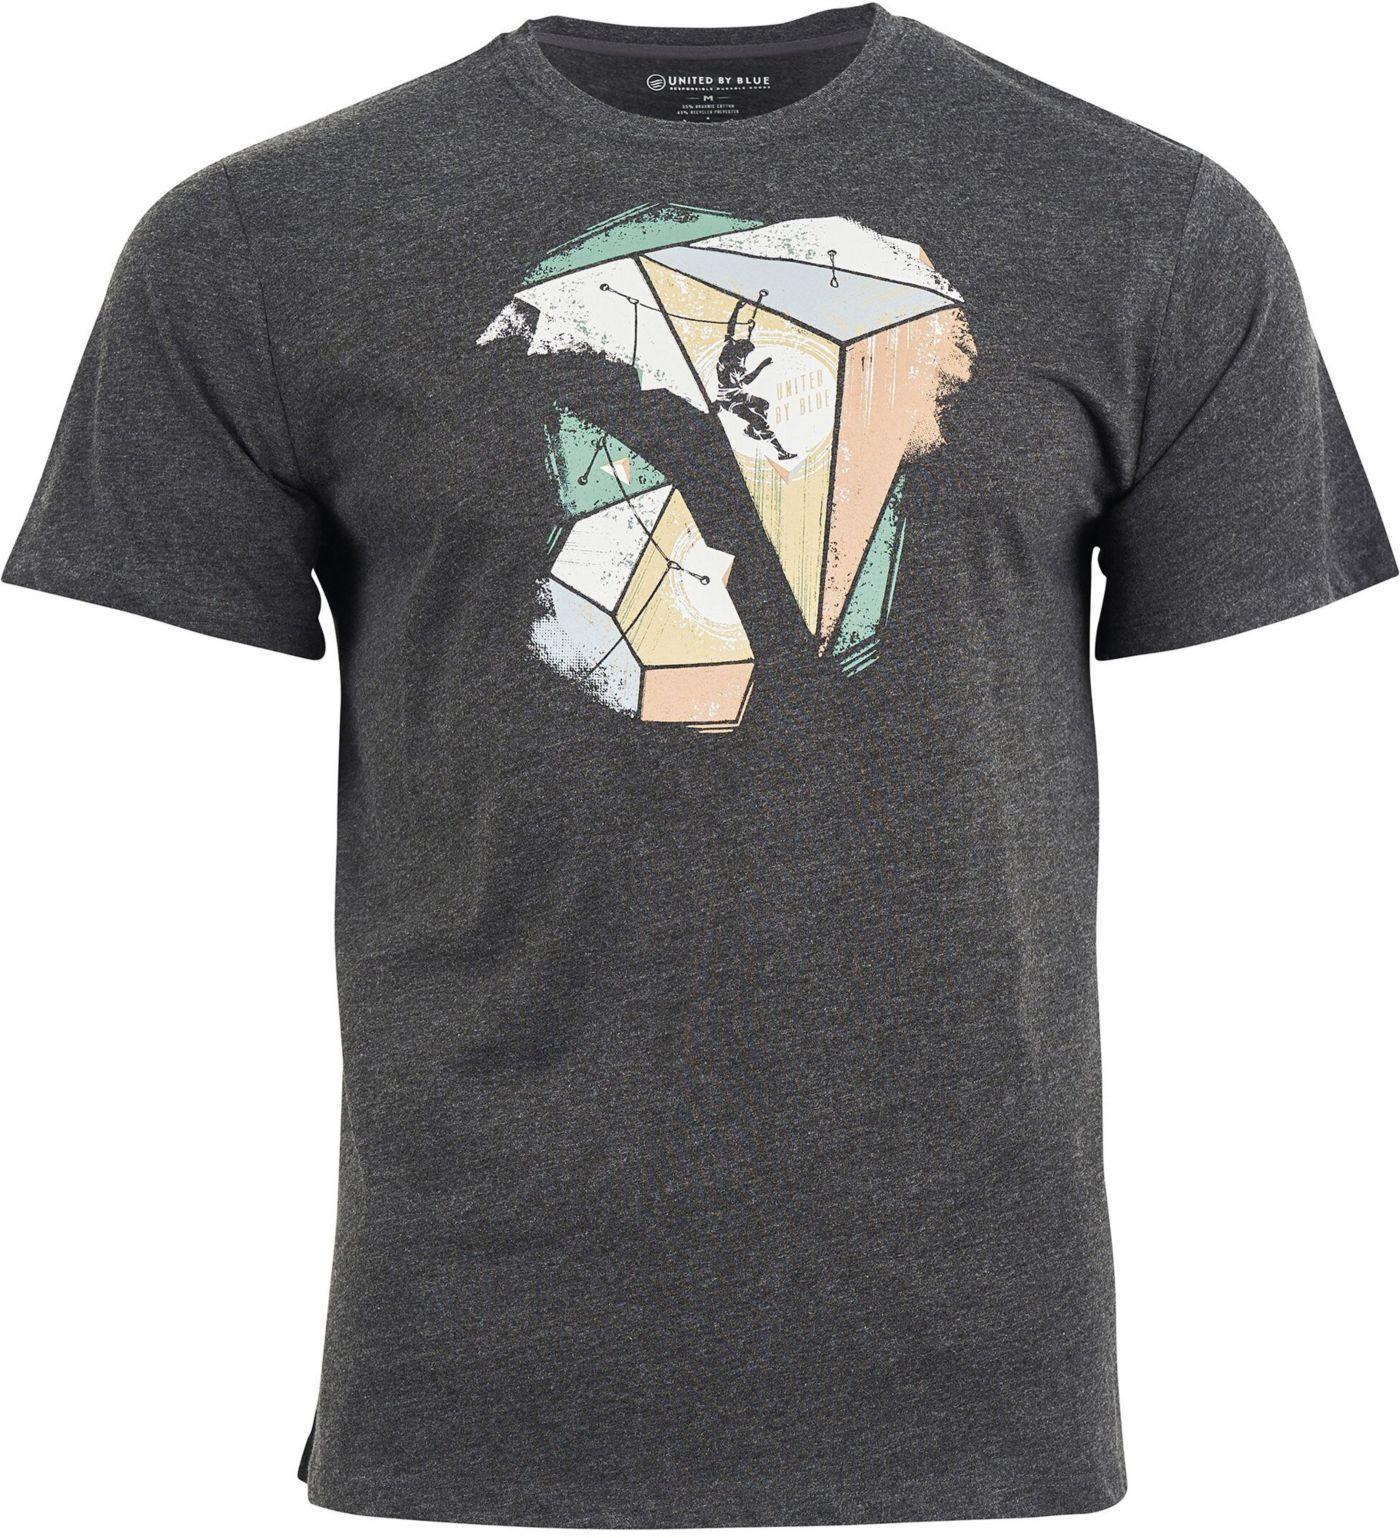 United by Blue Men's Geo Traverse Short Sleeve T-Shirt